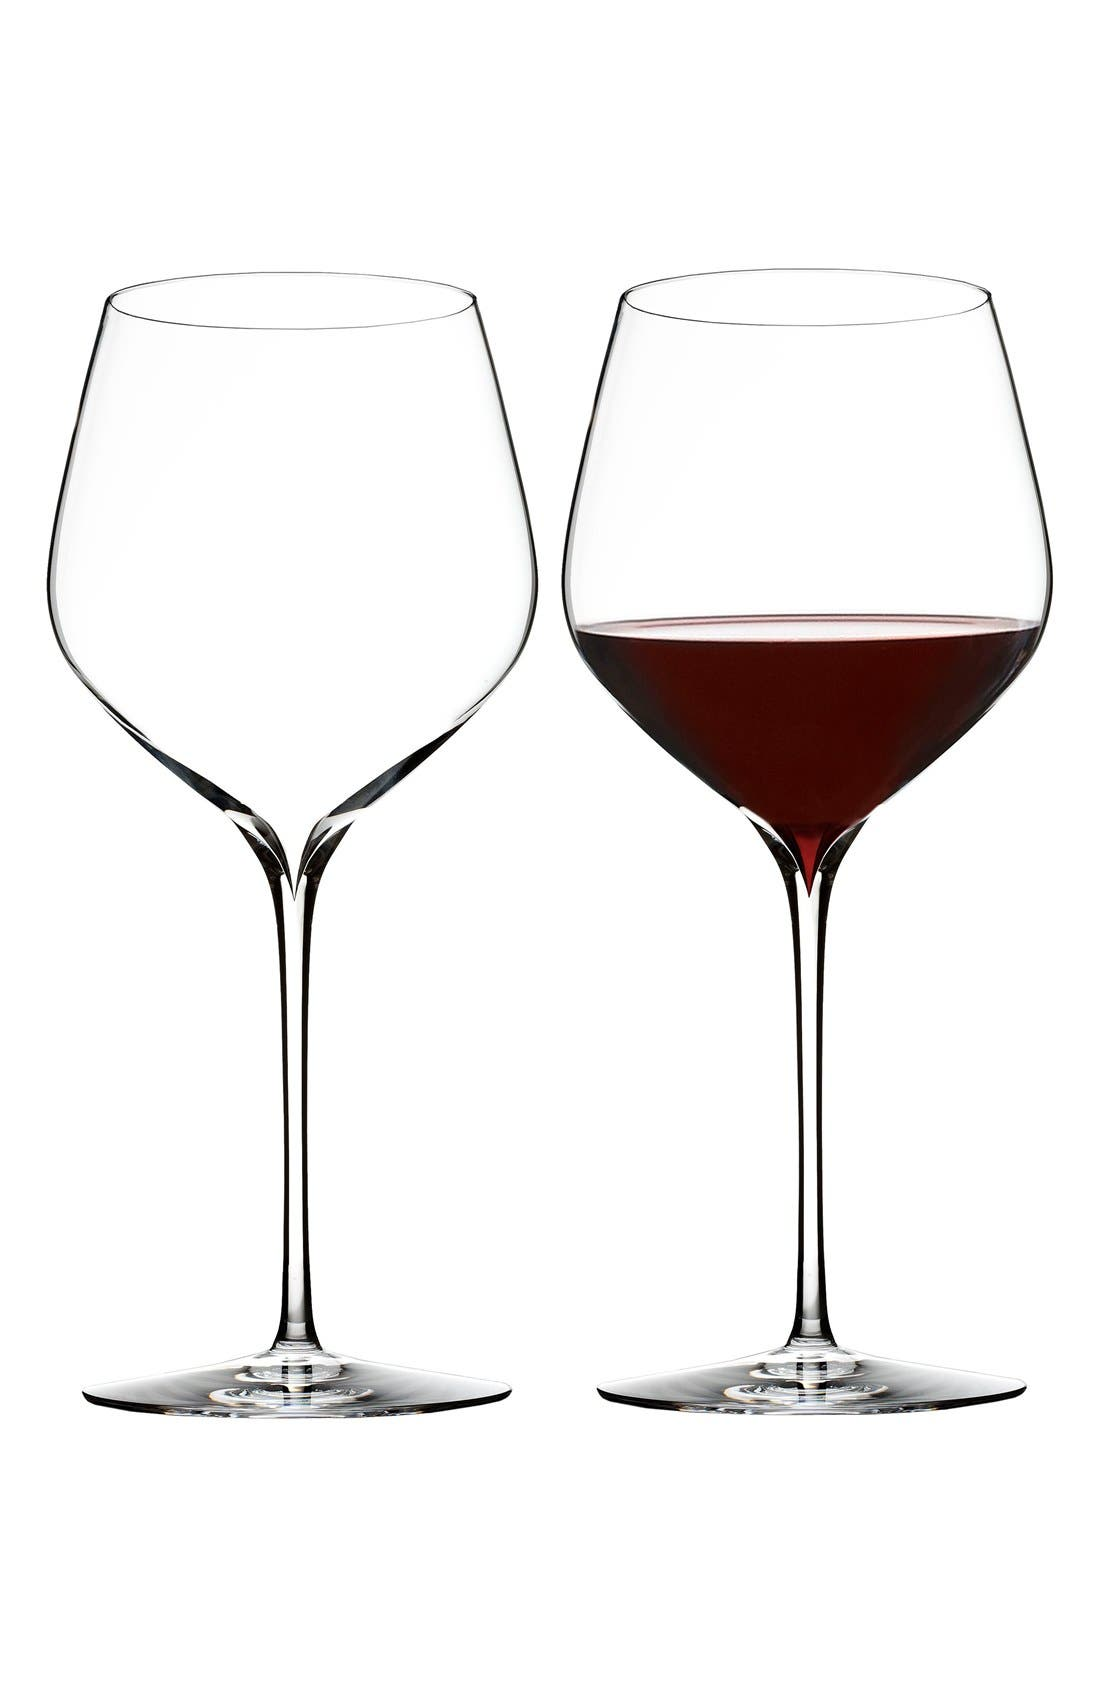 Alternate Image 2  - Waterford 'Elegance' Fine Crystal Cabernet Sauvignon Glasses (Set of 2)